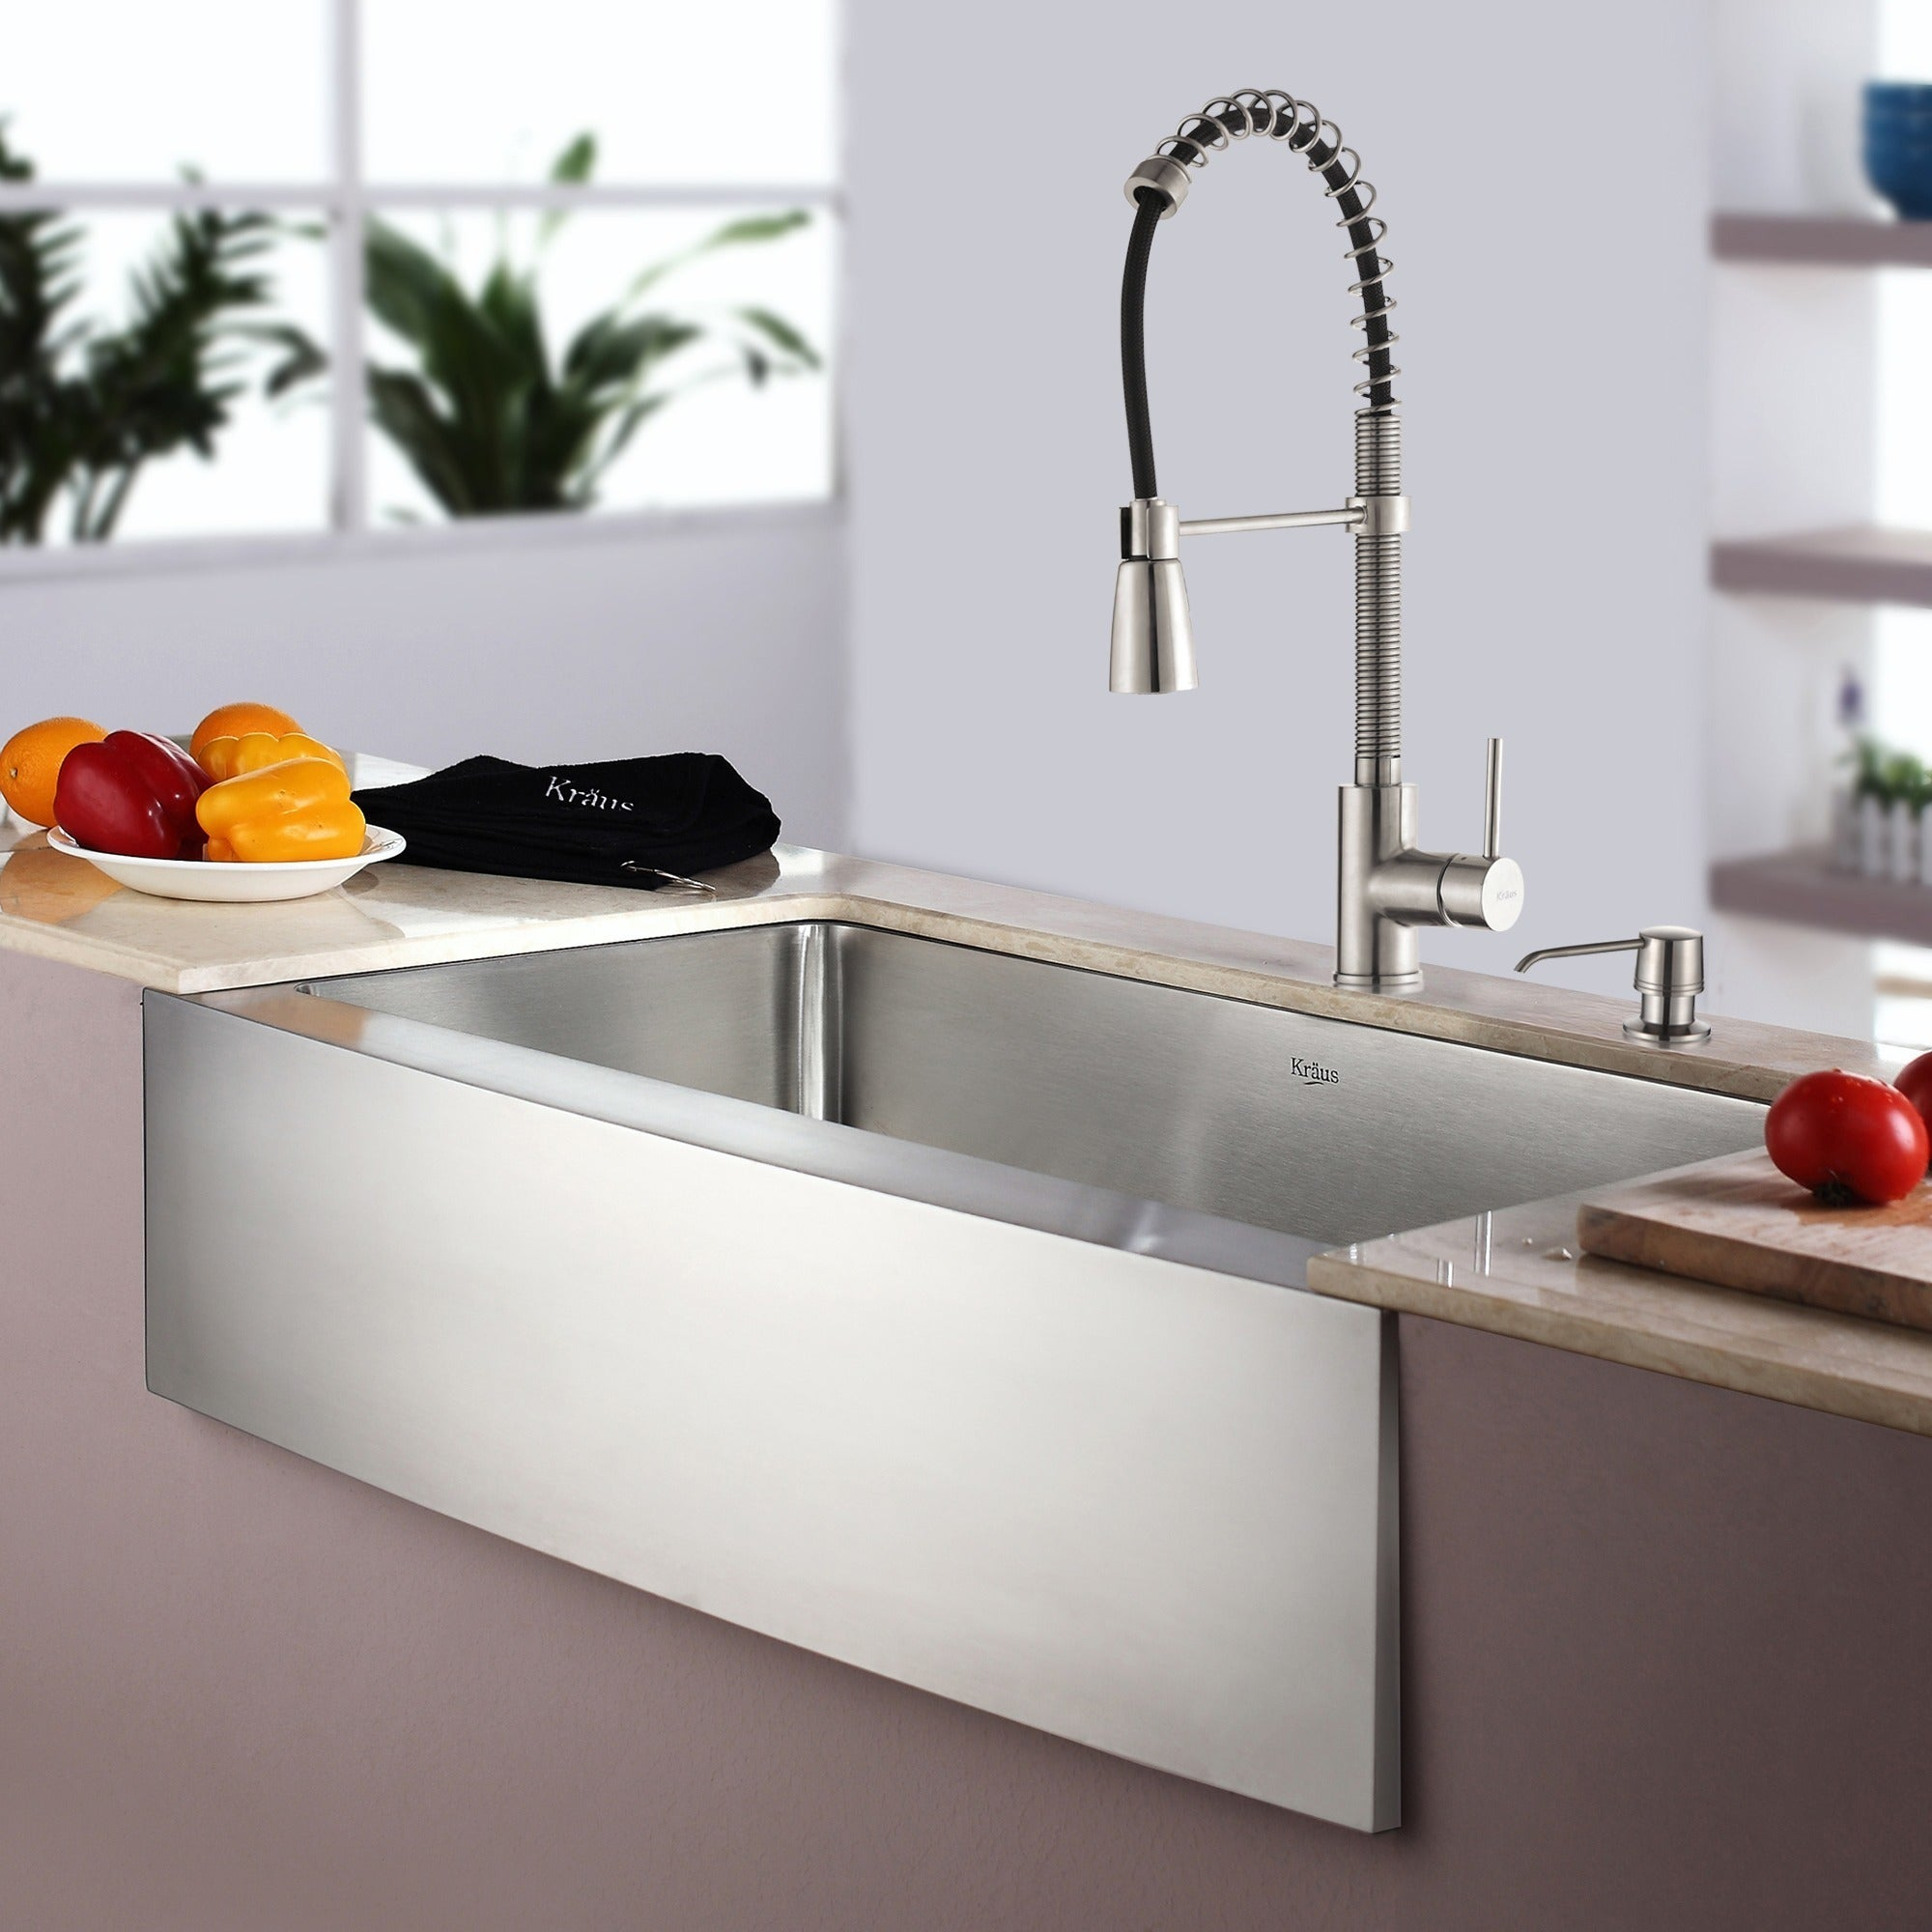 KRAUS 30 Inch Farmhouse Single Bowl Stainless Steel Kitchen Sink ...